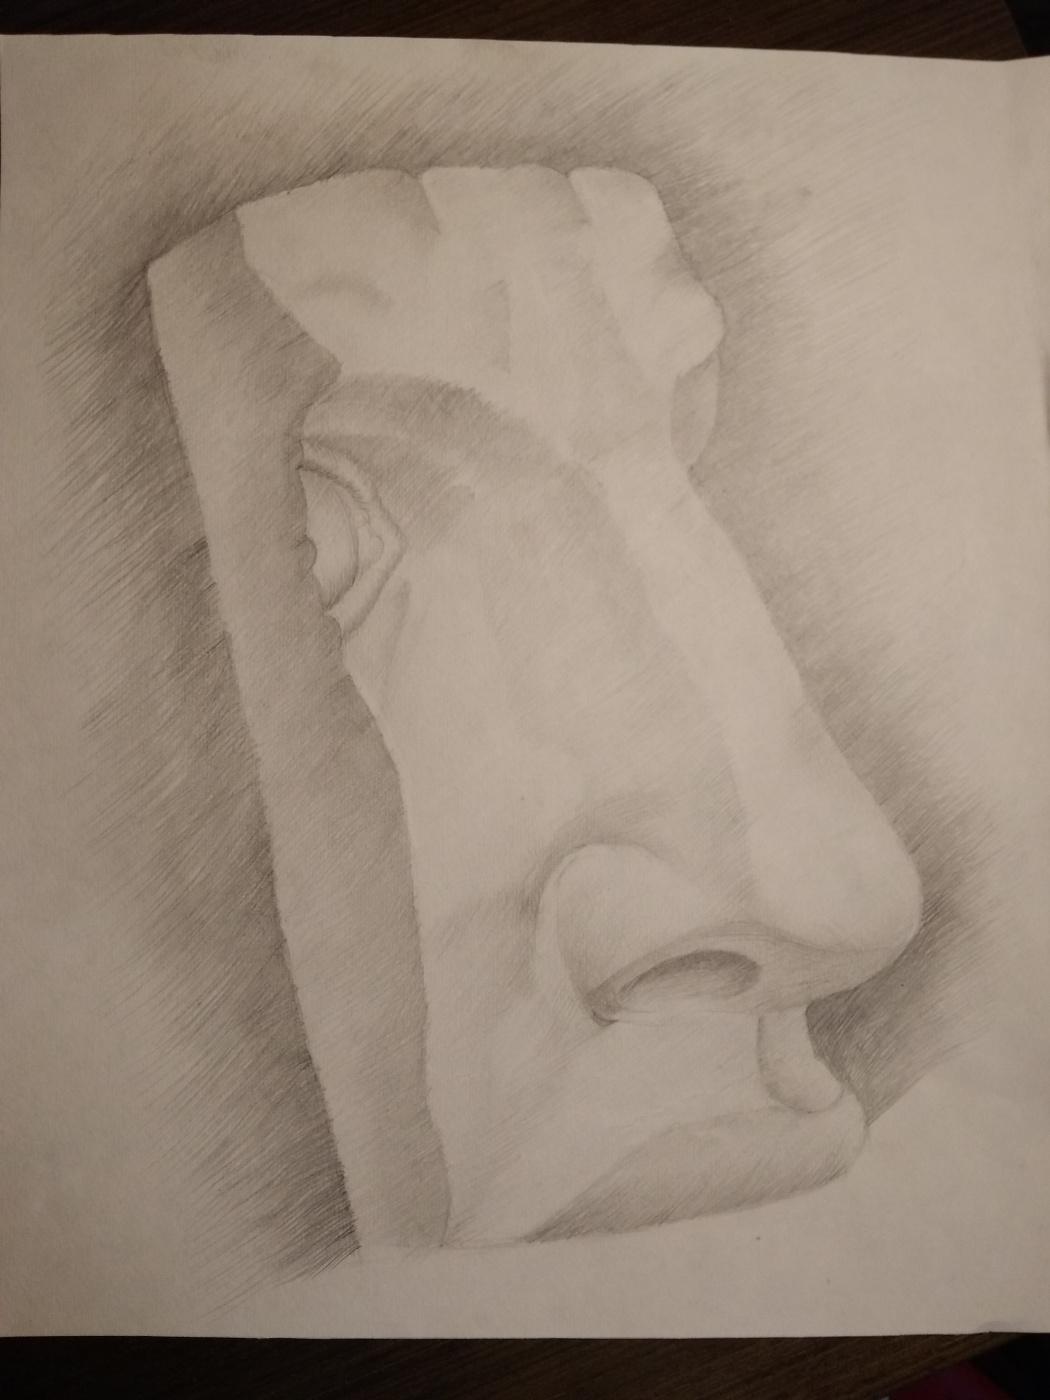 Novikov V.. Drawing, pencil, part of the face 90s